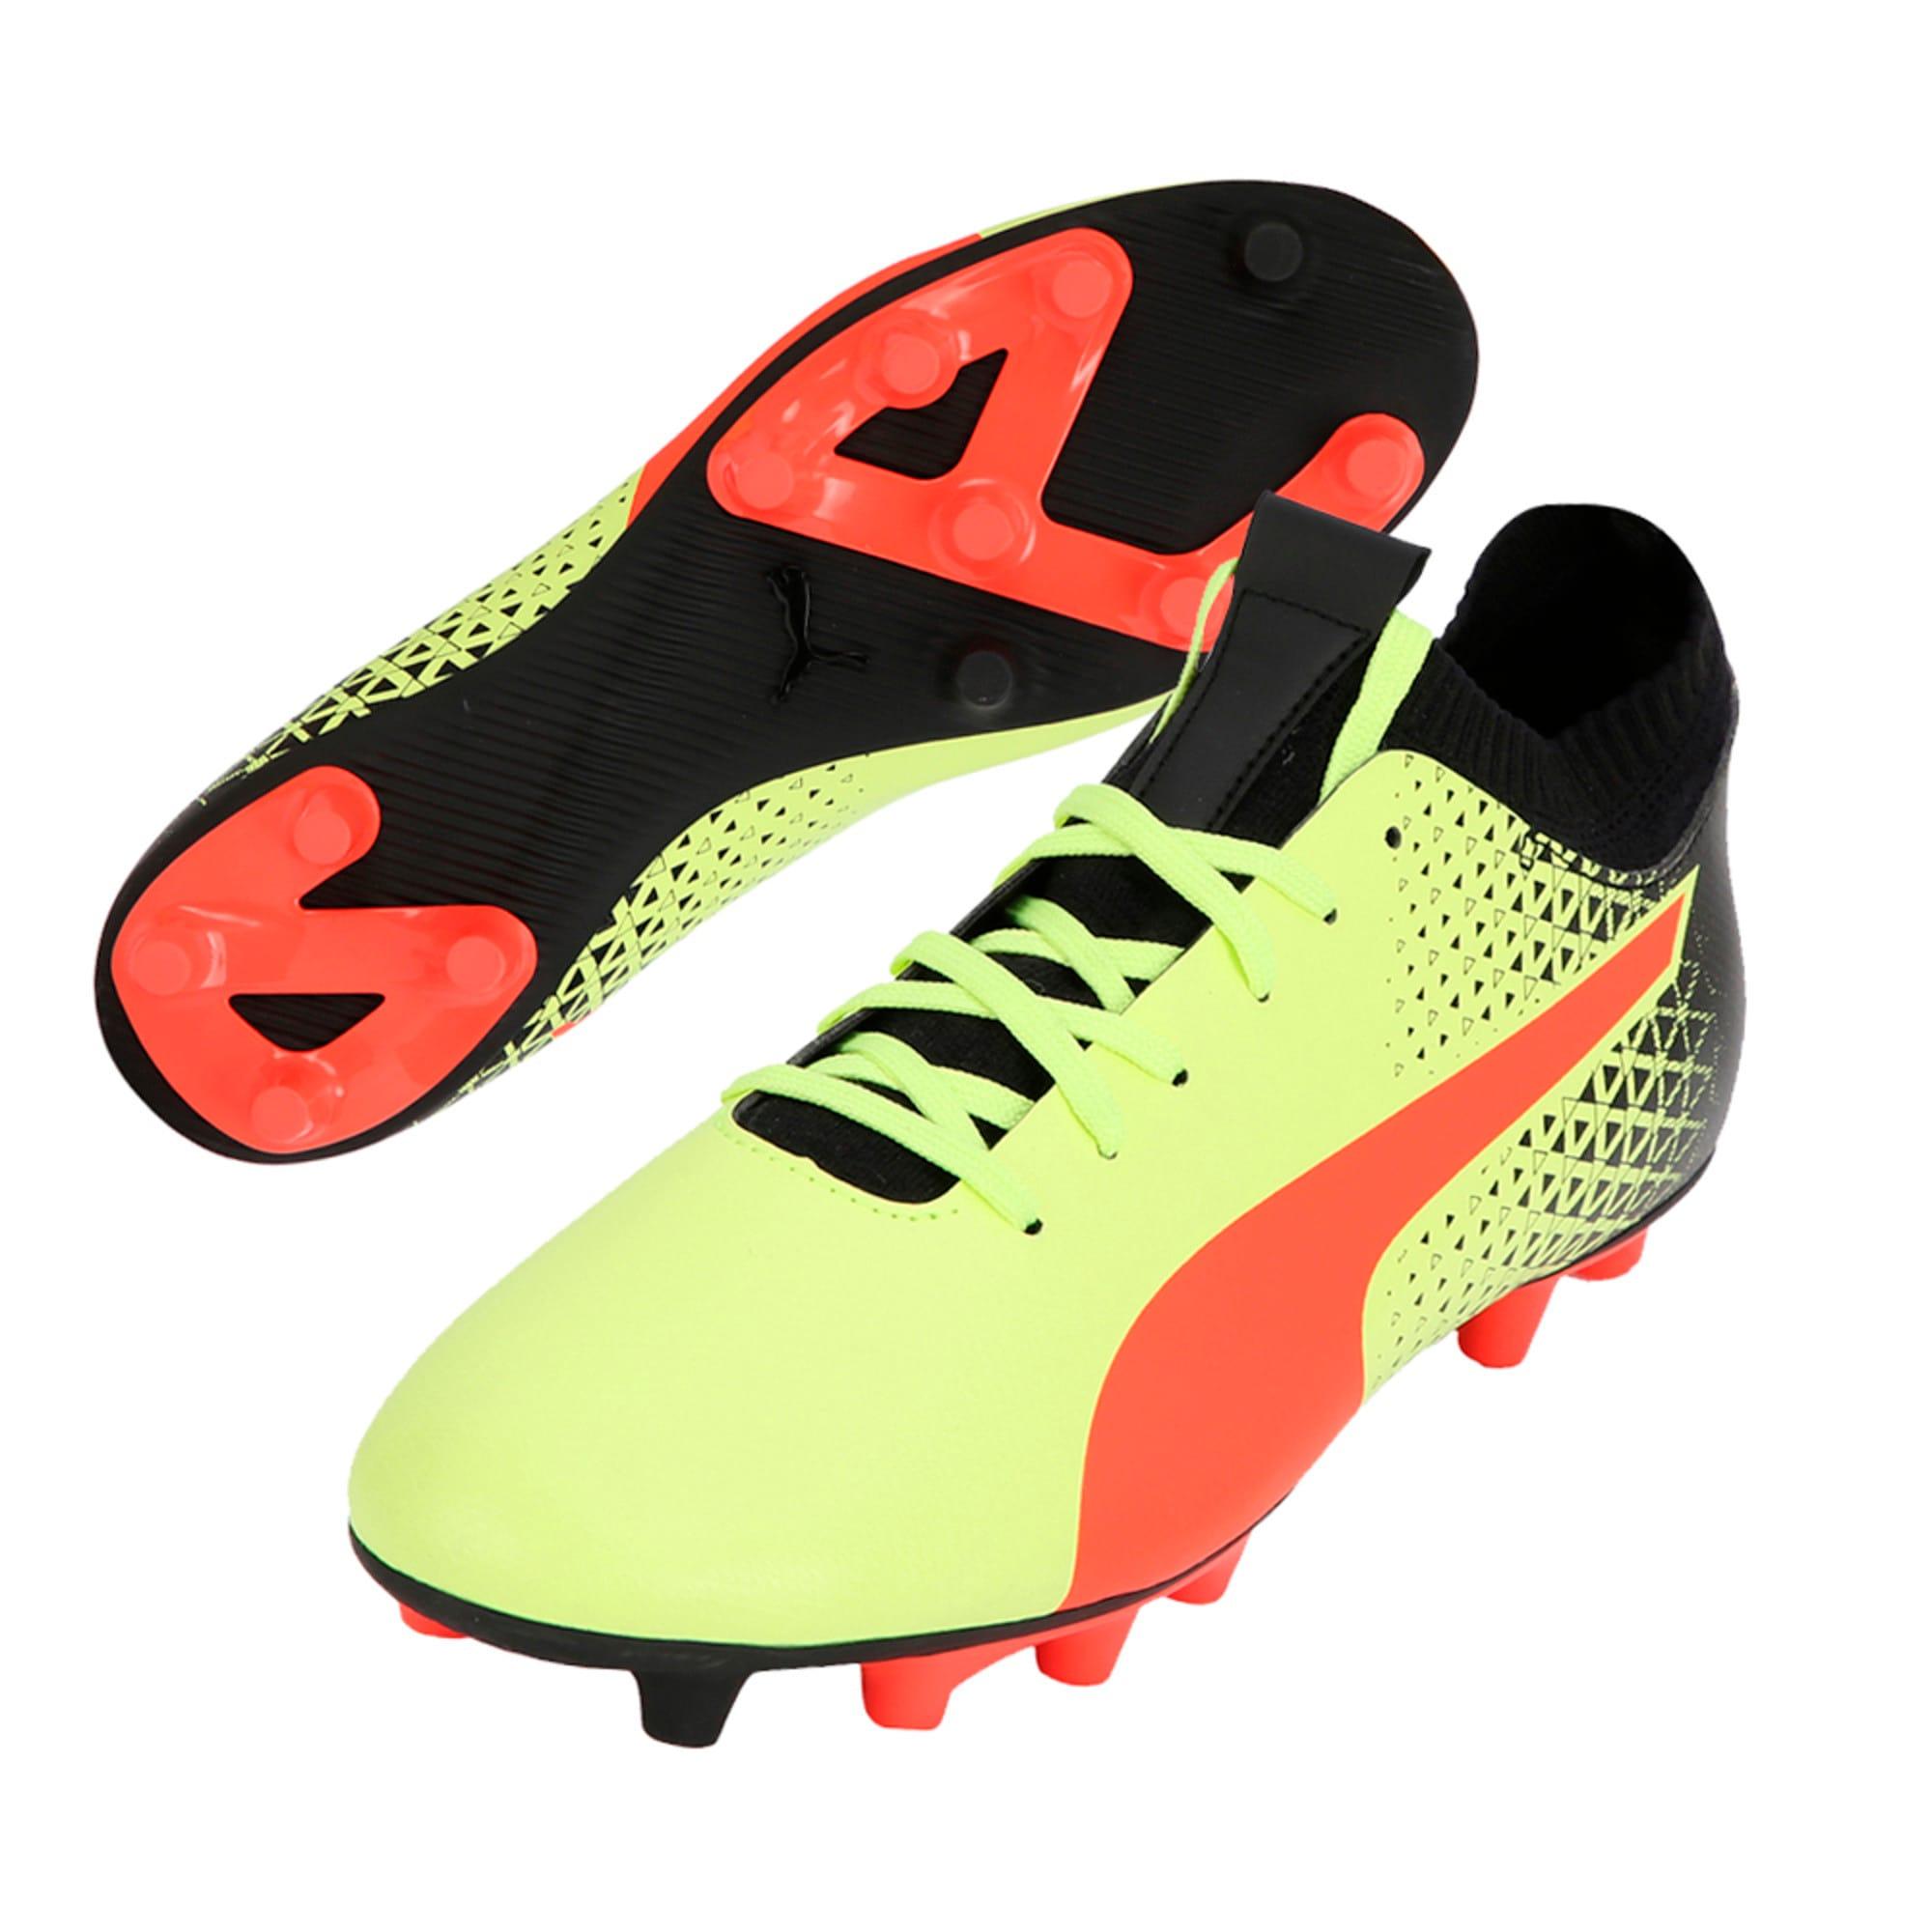 Thumbnail 6 of evoKNIT FG Men's Football Boots, Yellow-Red-Black, medium-IND